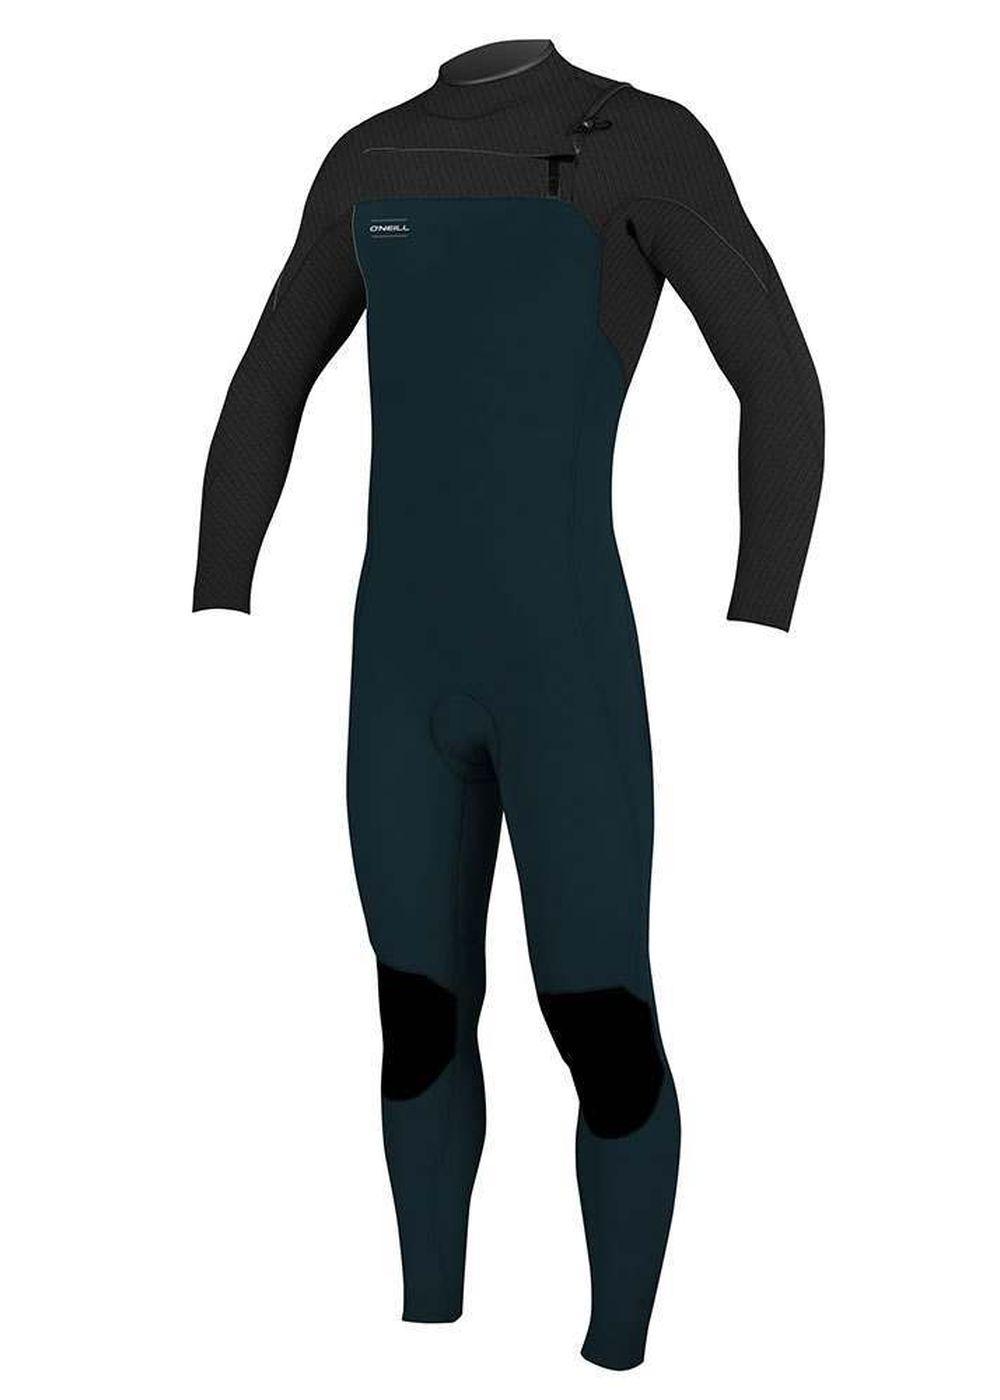 Oneill Hyperfreak Fz 5/4 Wetsuit 2018 Slate/blk Picture